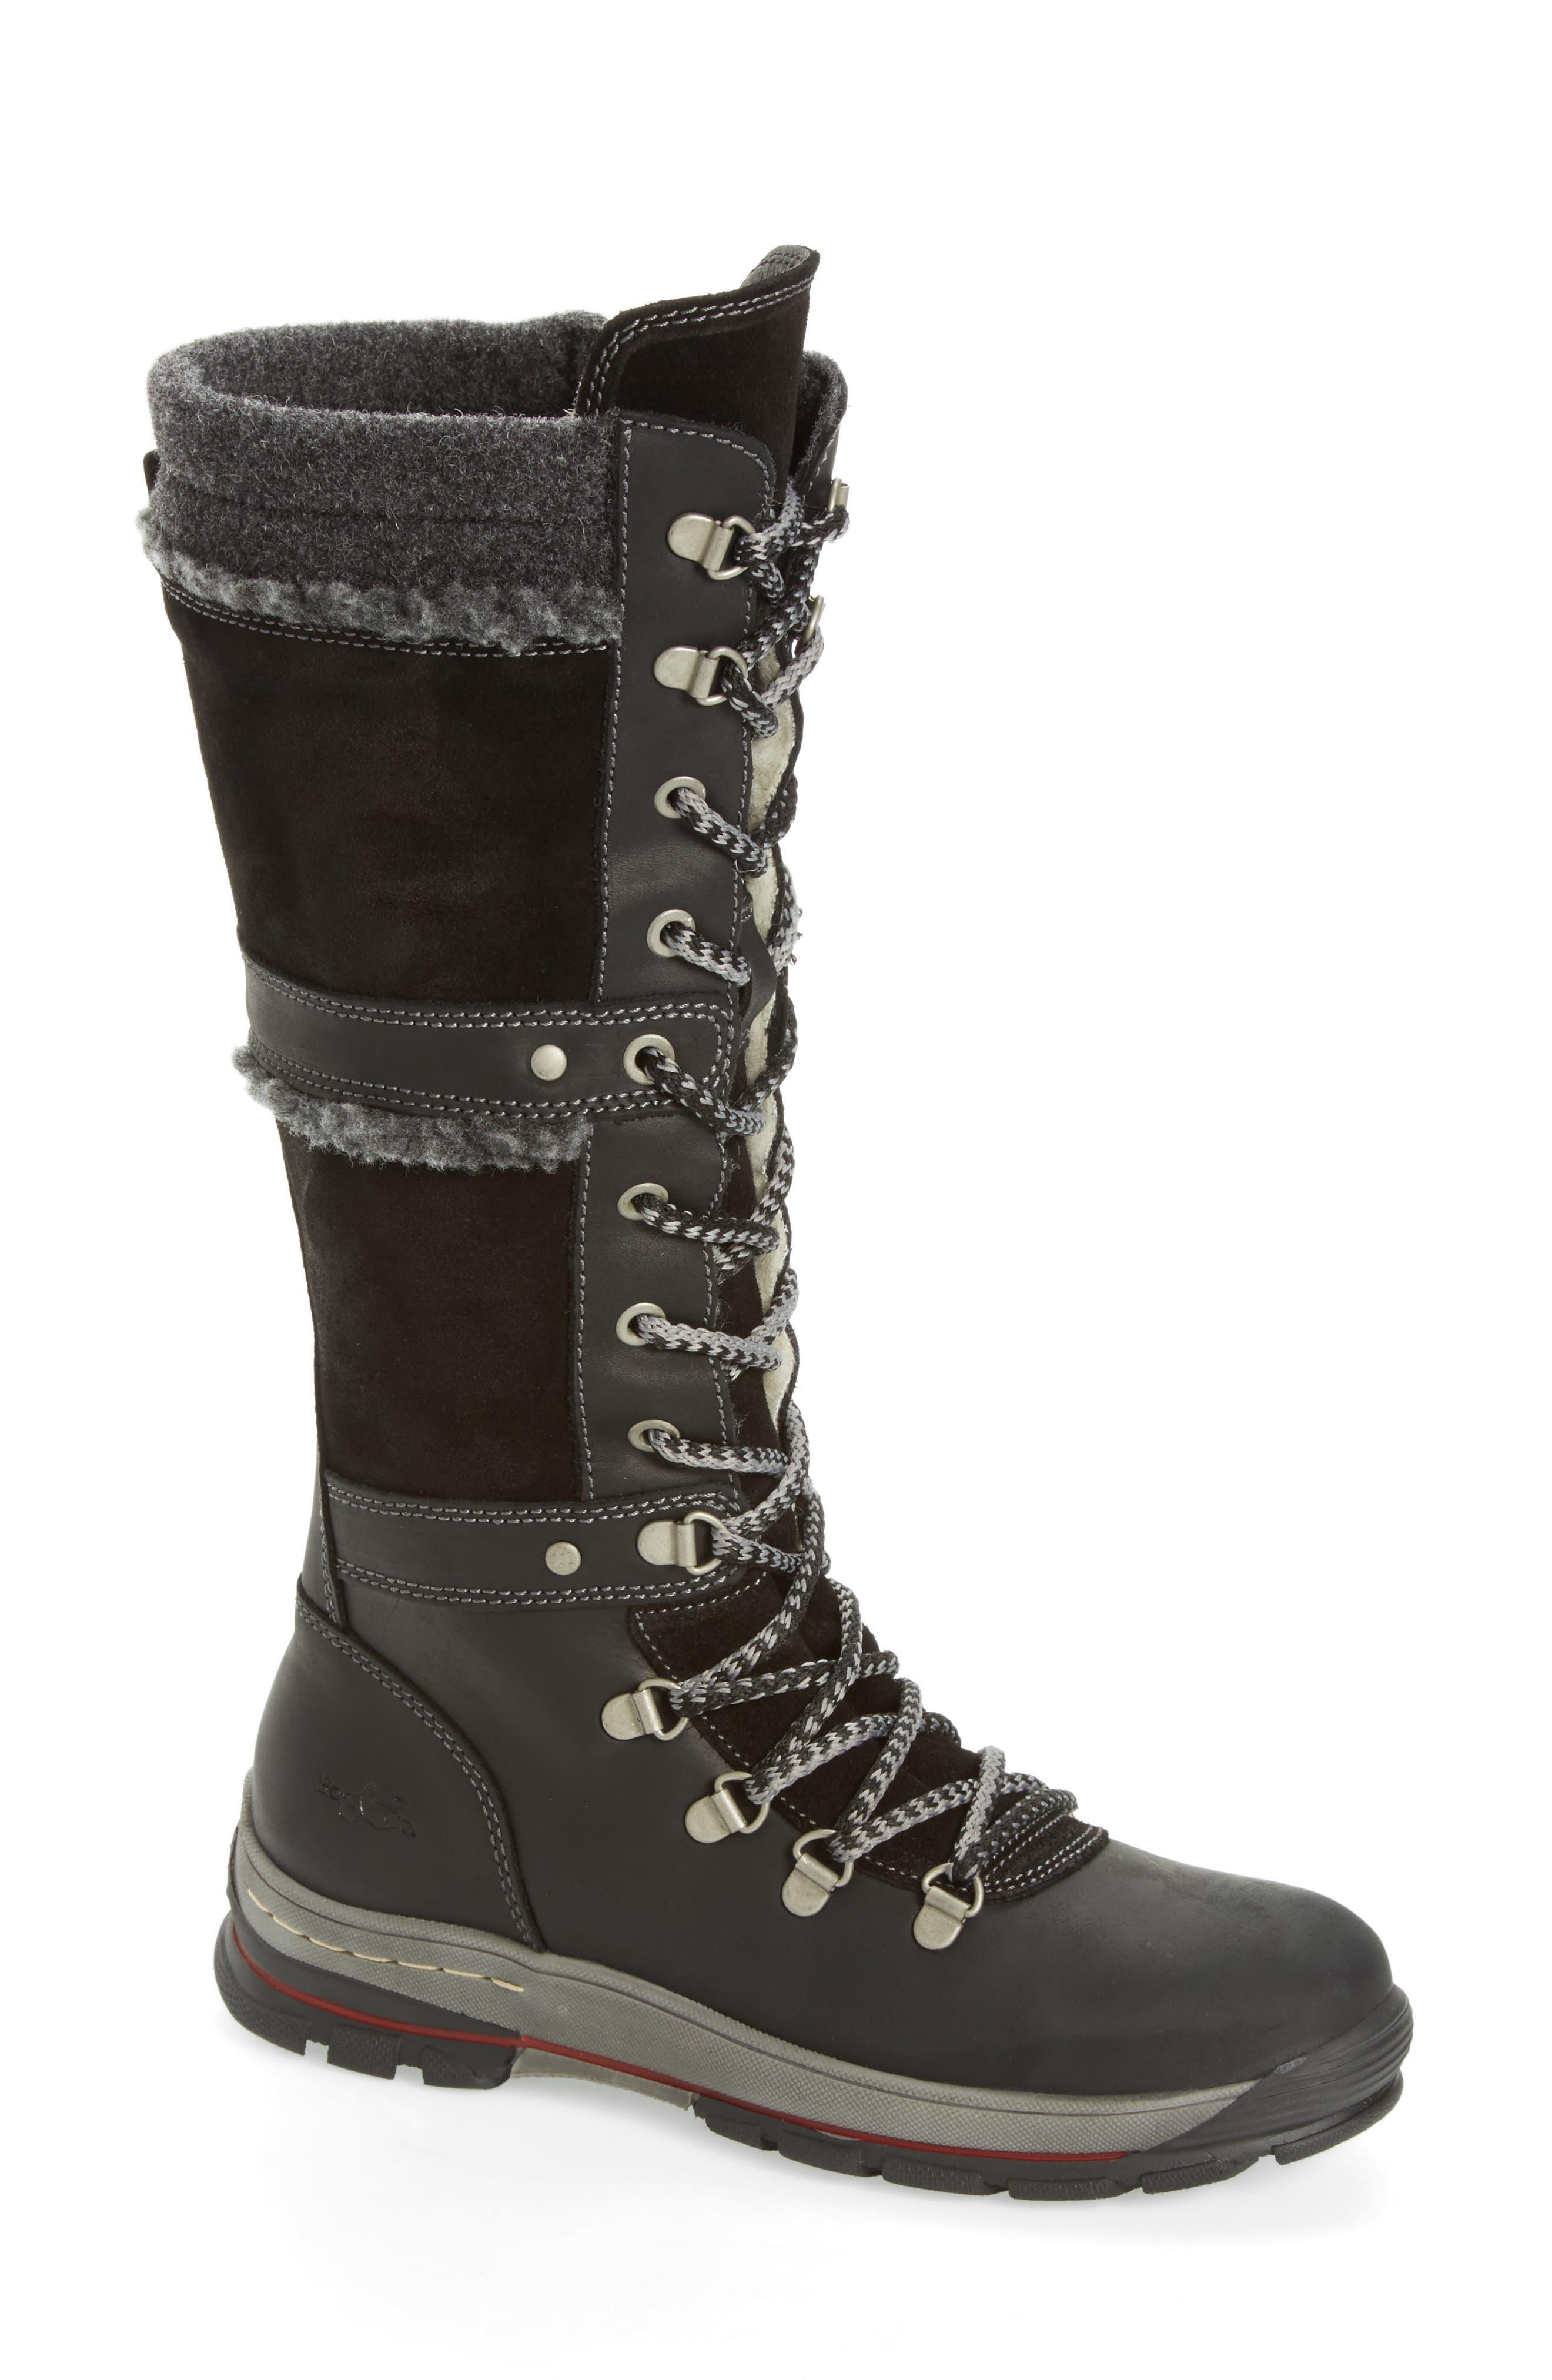 Gabriella Waterproof Boot,                         Main,                         color, Black/ Dark Grey